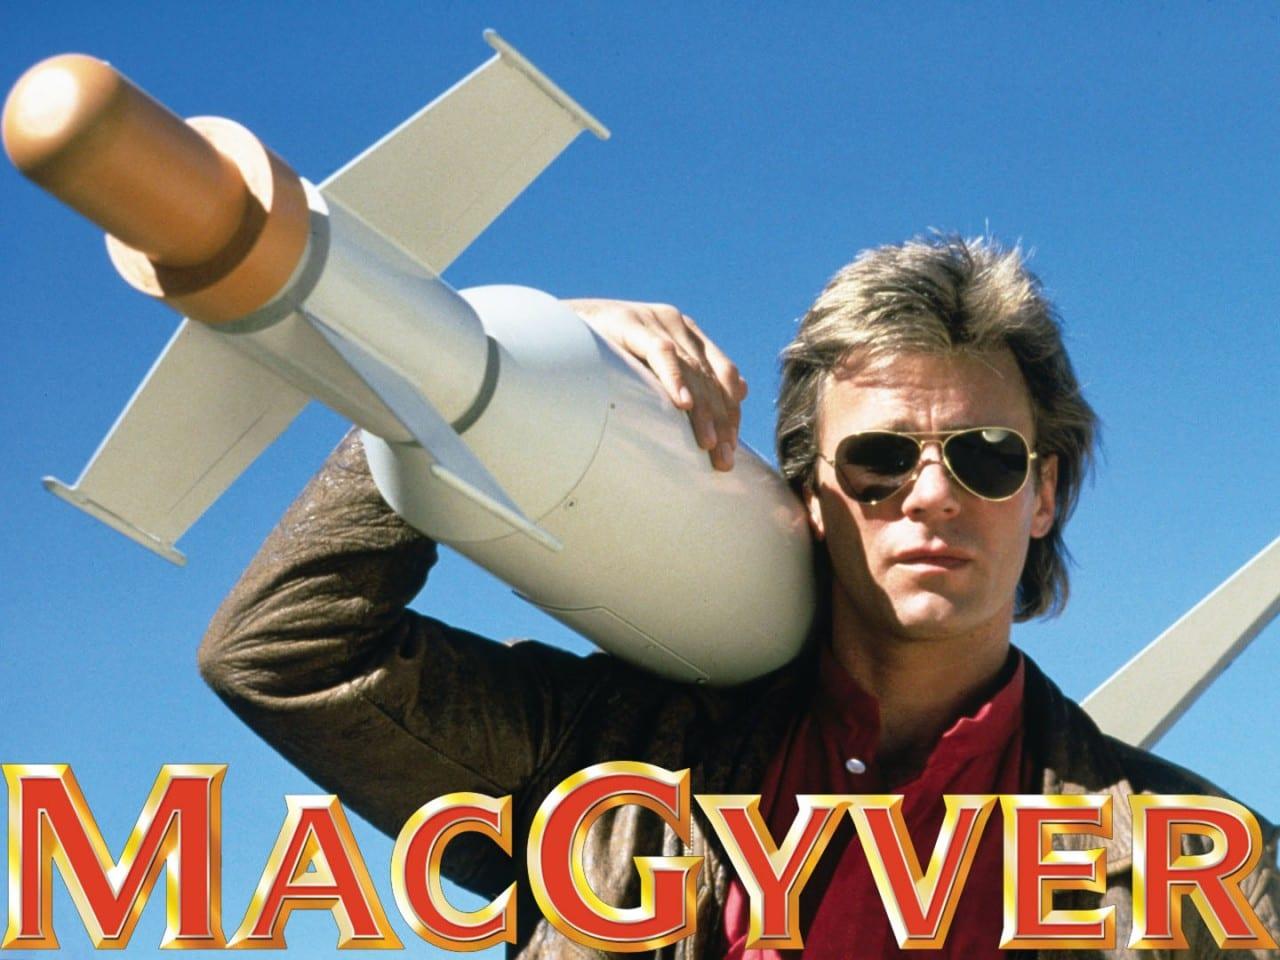 MacGyver – Η επιστροφή στην τηλεόραση!